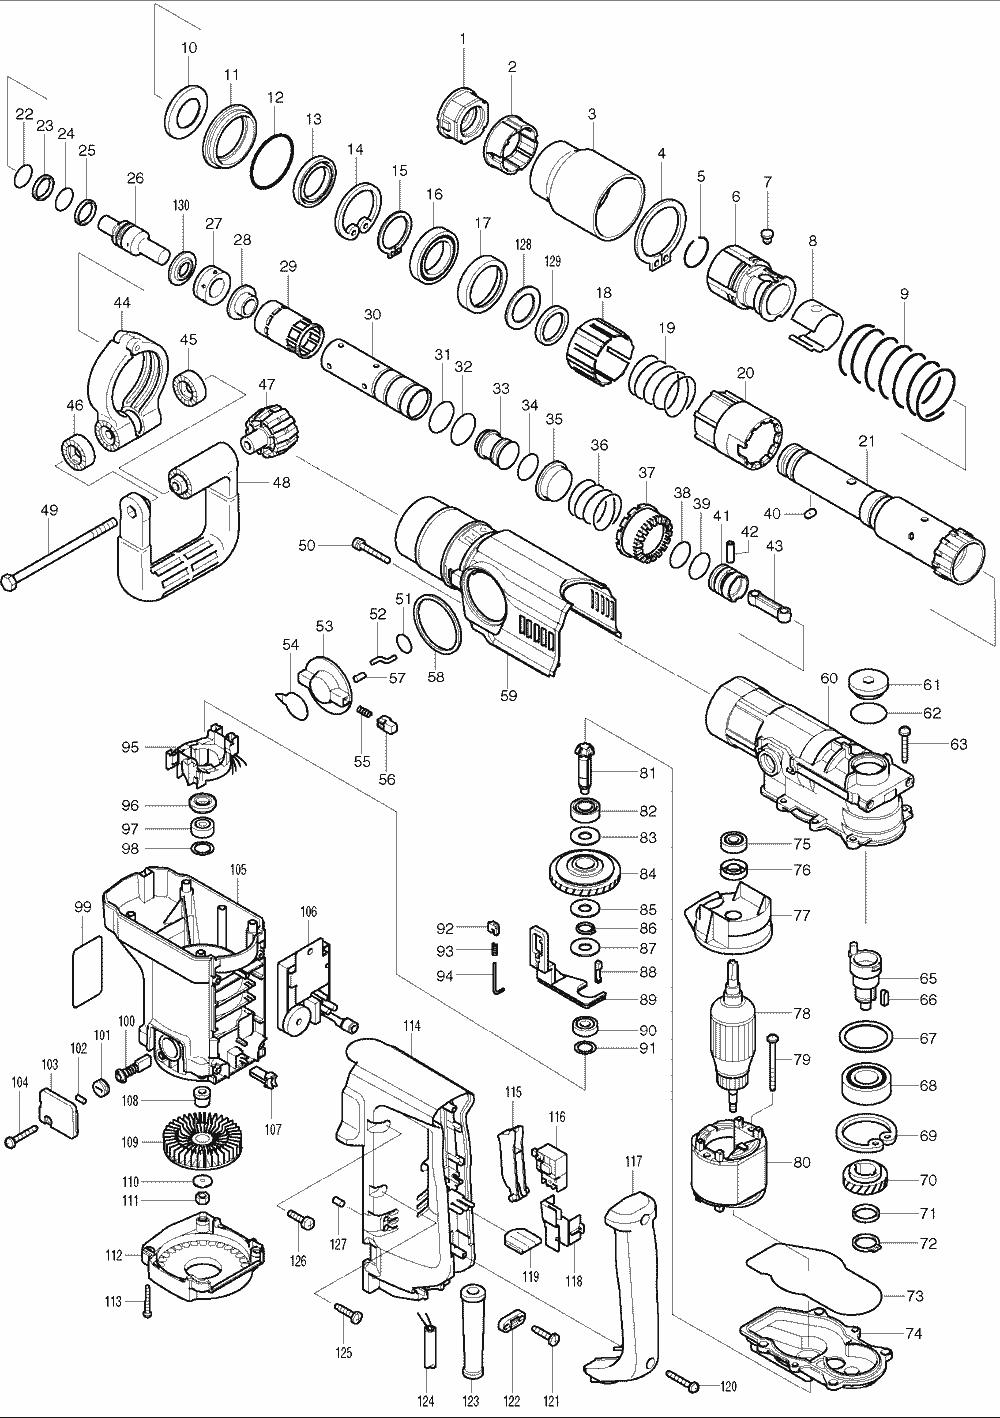 Makita HR4040C Parts List | Makita HR4040C Repair Parts | OEM Parts on